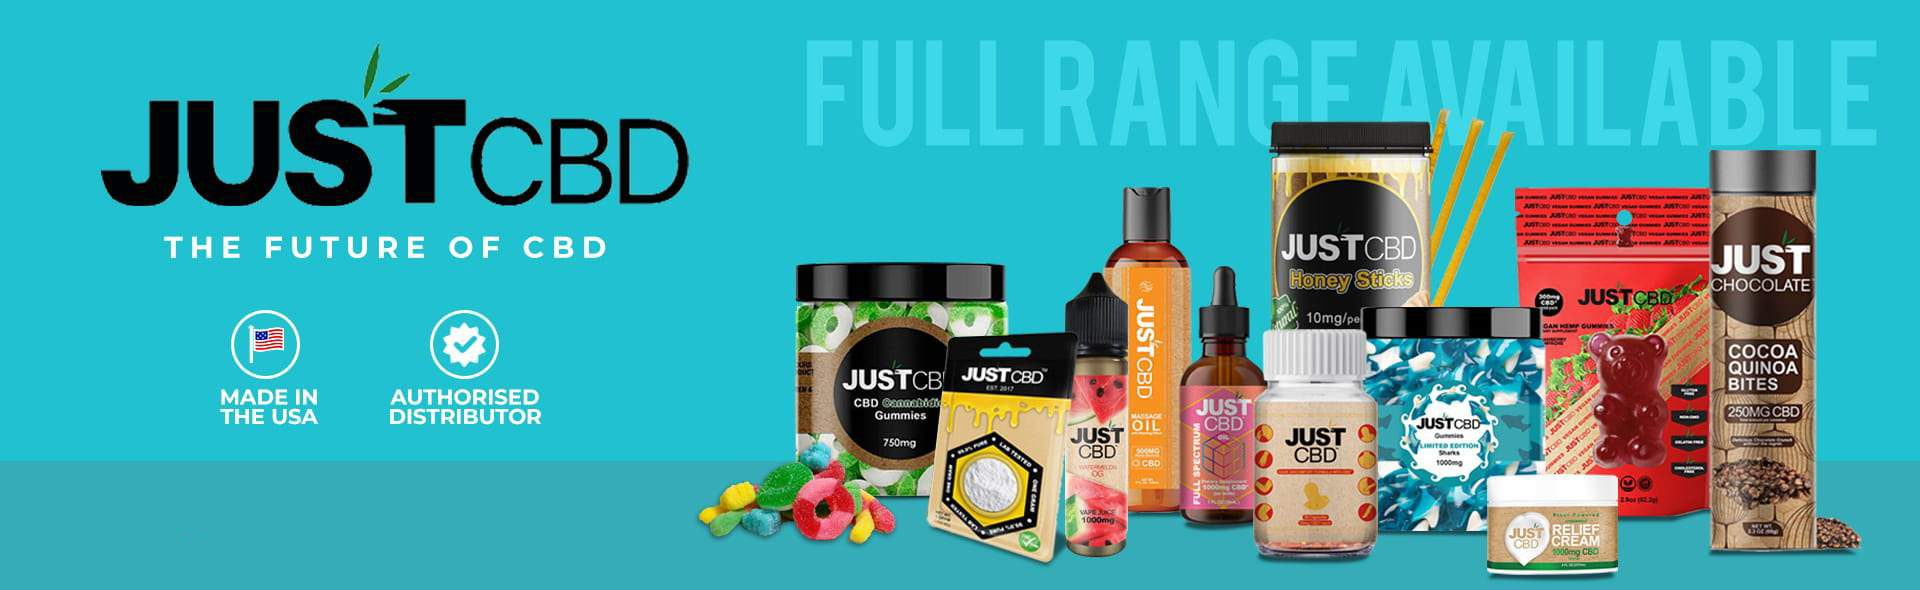 just cbd full range of cbd products